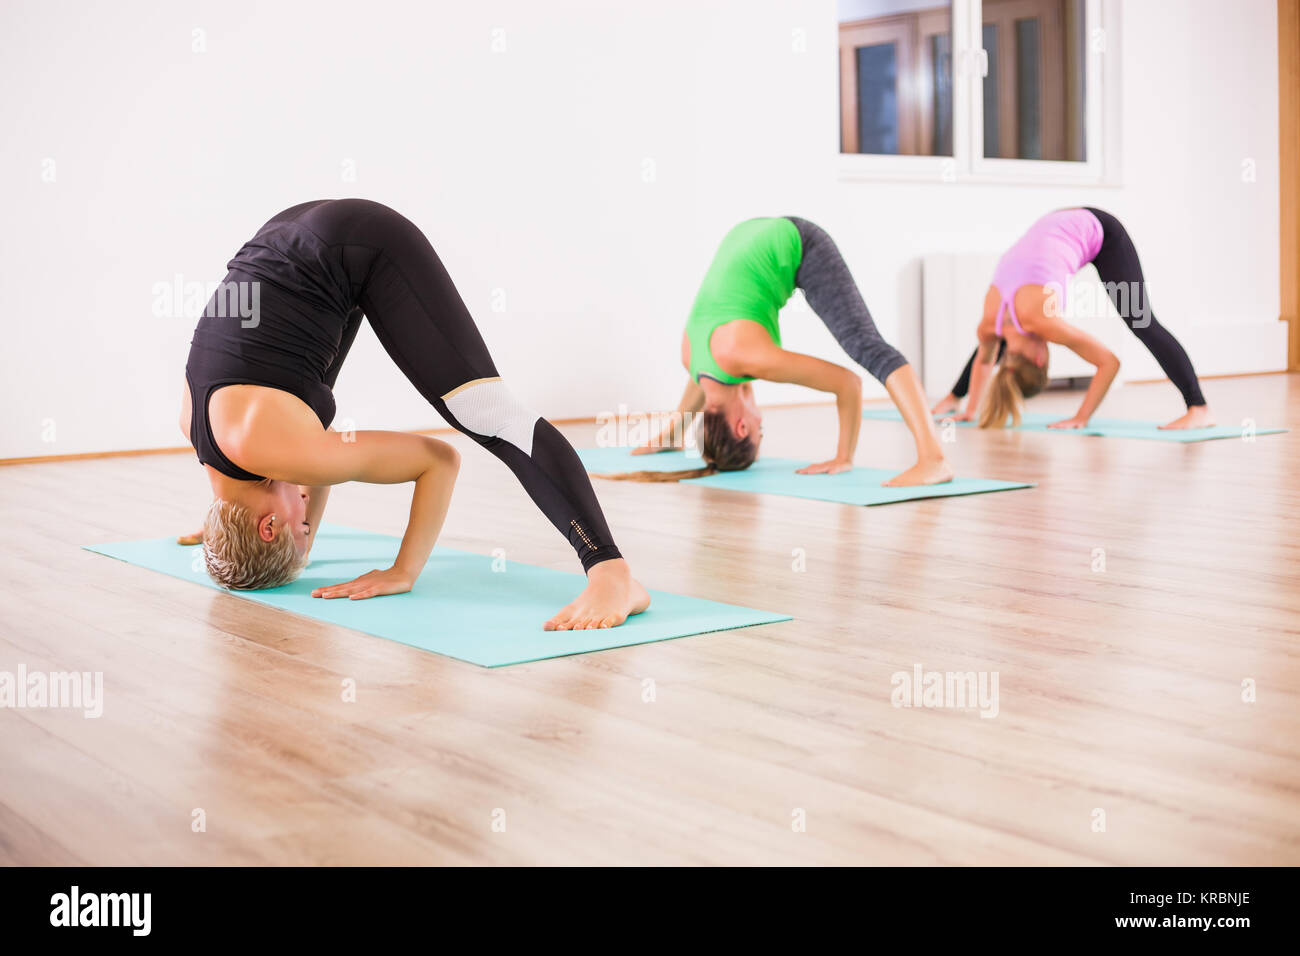 Three girls practicing yoga, - Stock Image